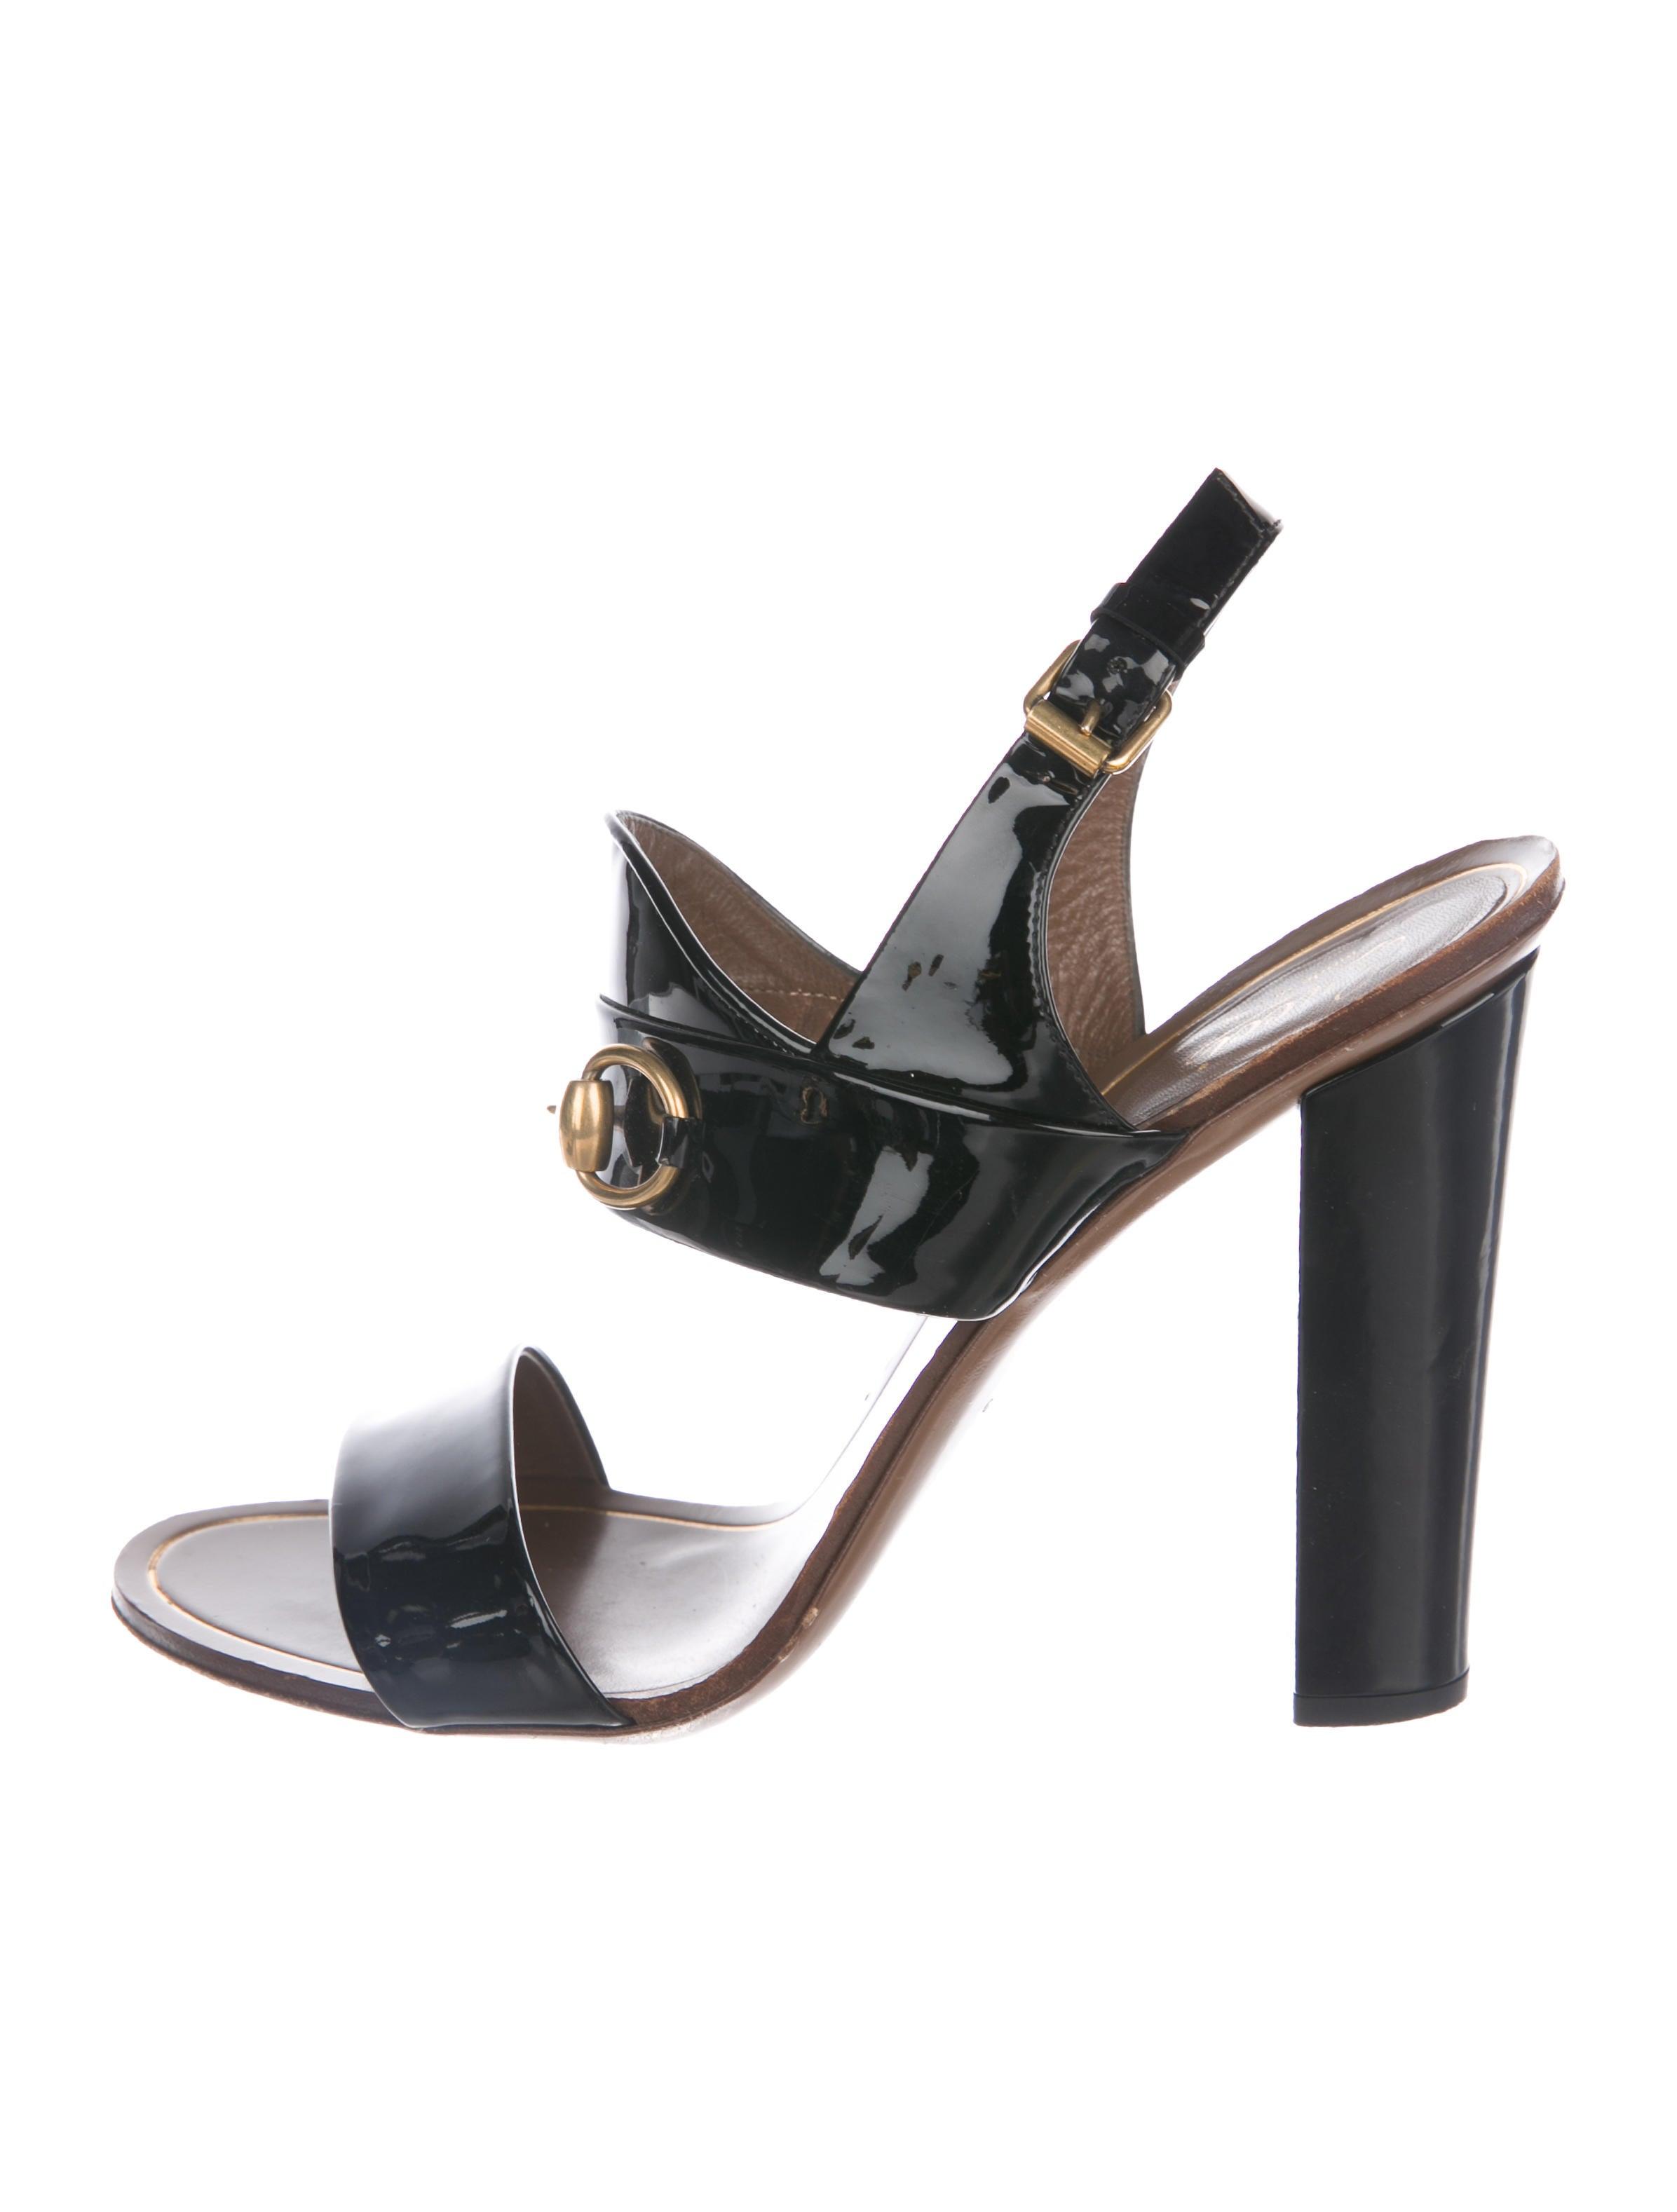 33fafe7c5330 Gucci Patent Leather Horsebit Sandals - Shoes - GUC262545